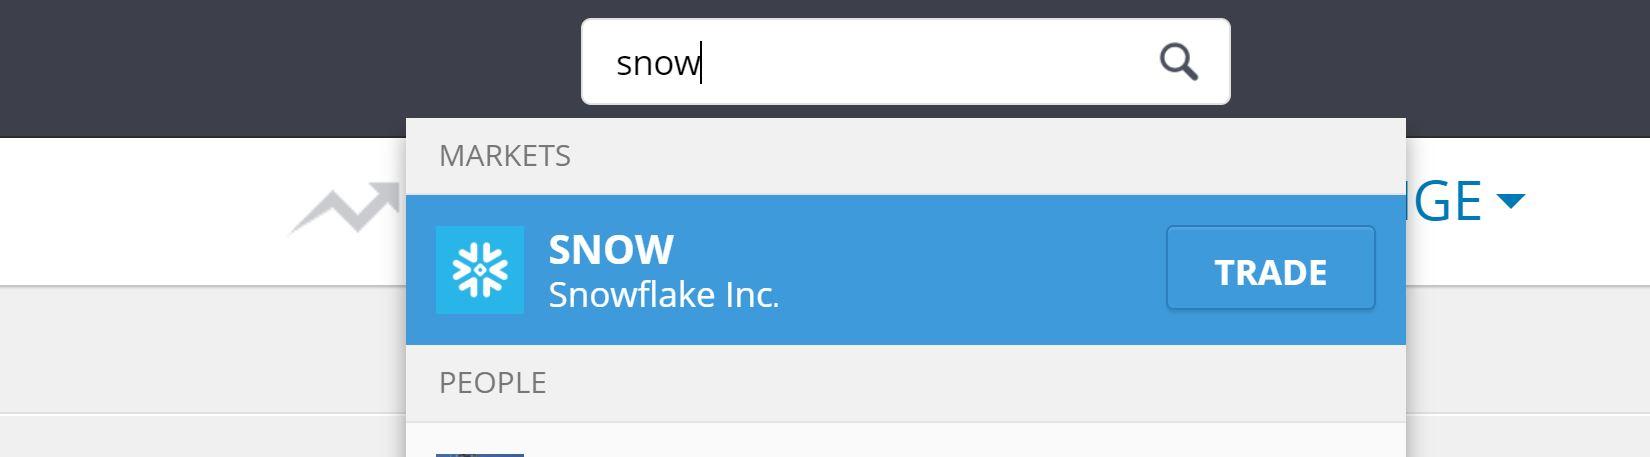 Buy Snowflake shares on eToro